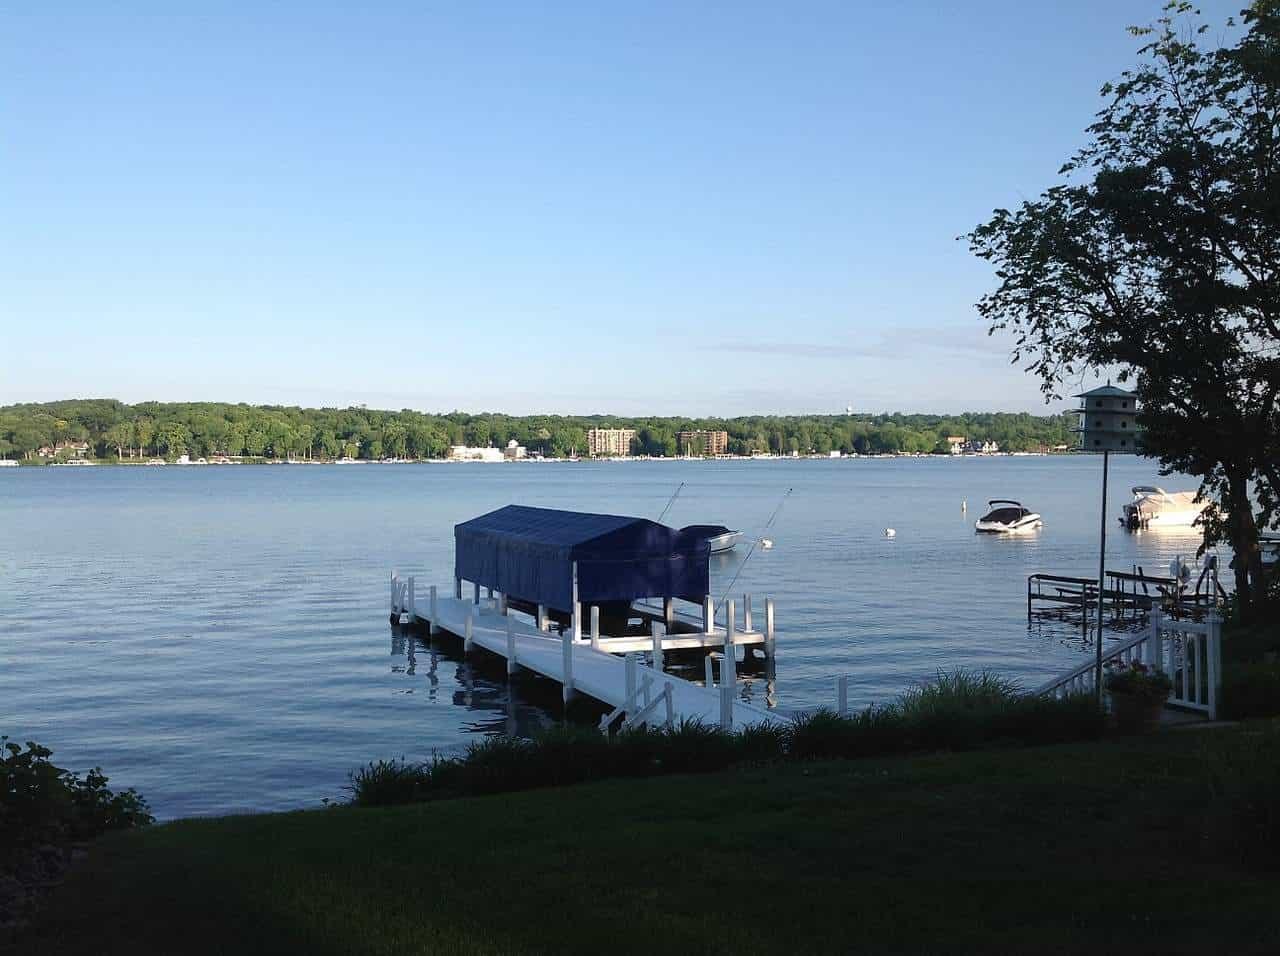 best wisconsin vacation ideas, cabin getaway, lake geneva, door county, madison, milwaukee, wisconsin weekend trip, getwaway, hiking, outdoor, lake cabin